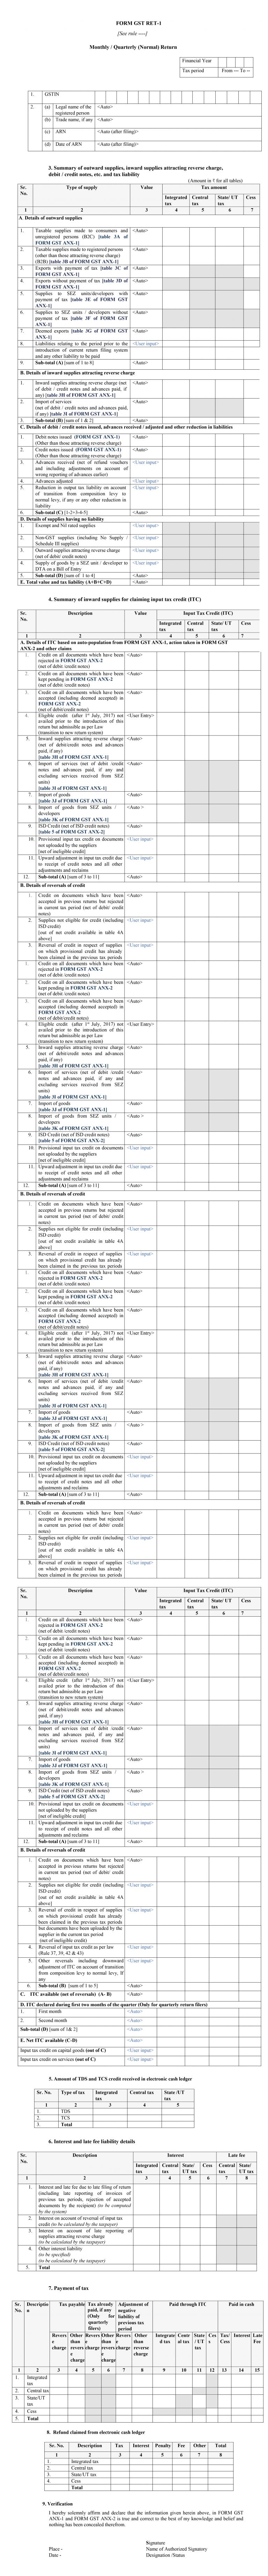 GST RET-1 Form Format